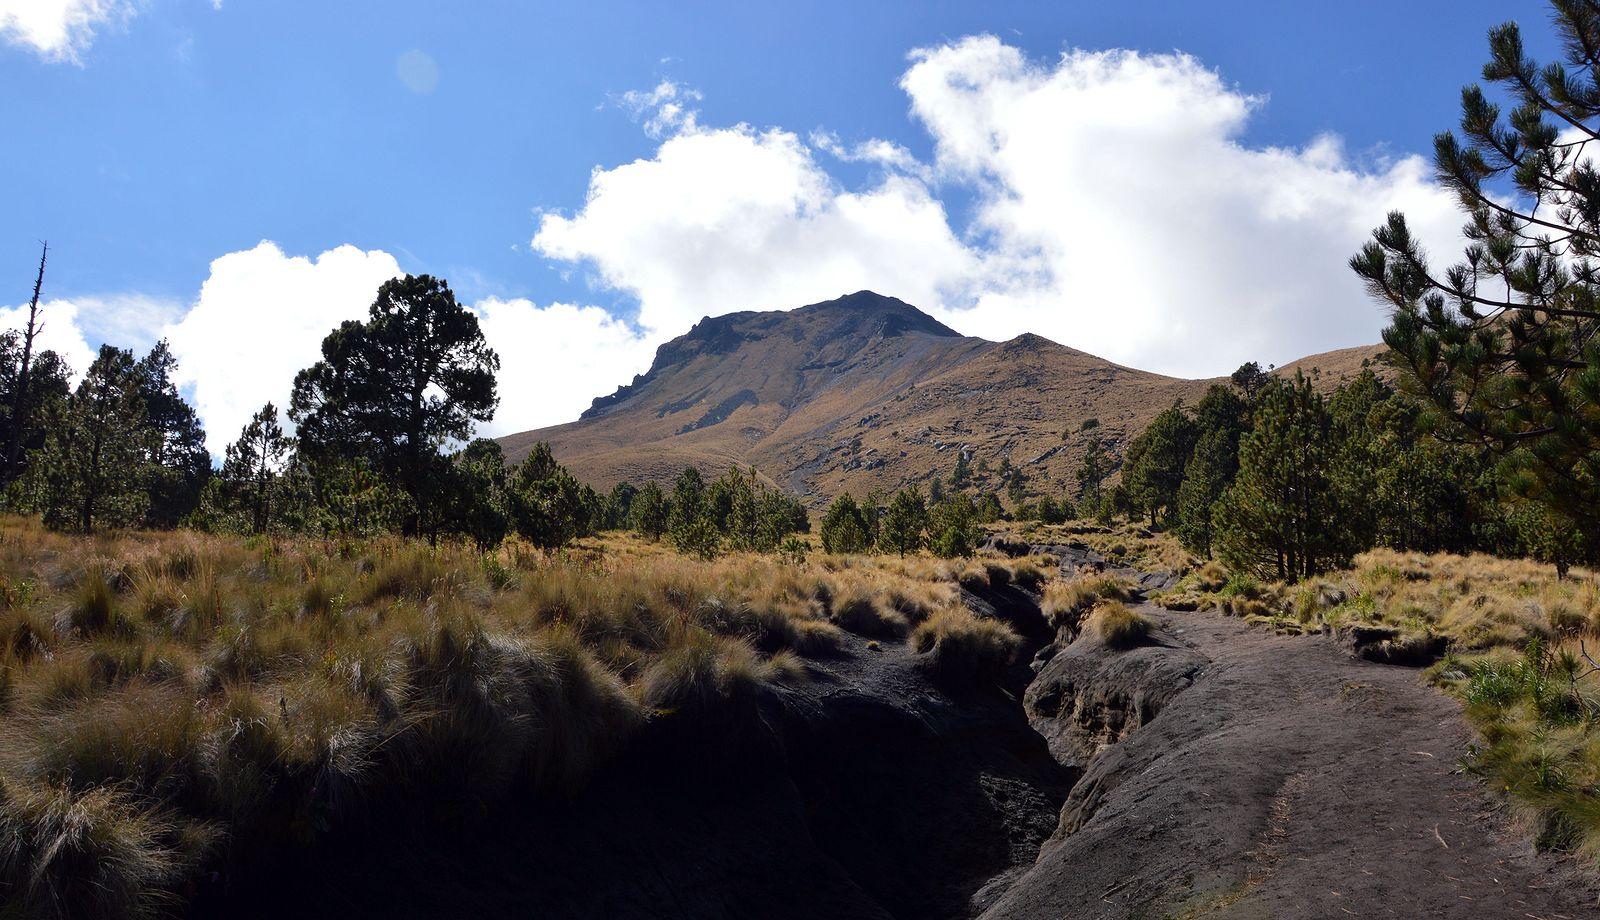 Pred sebou vidíme La Malinche 4462 m, ideme naň z Il Malintzi 3083 m. Je to naša prvá aklimatizácia.